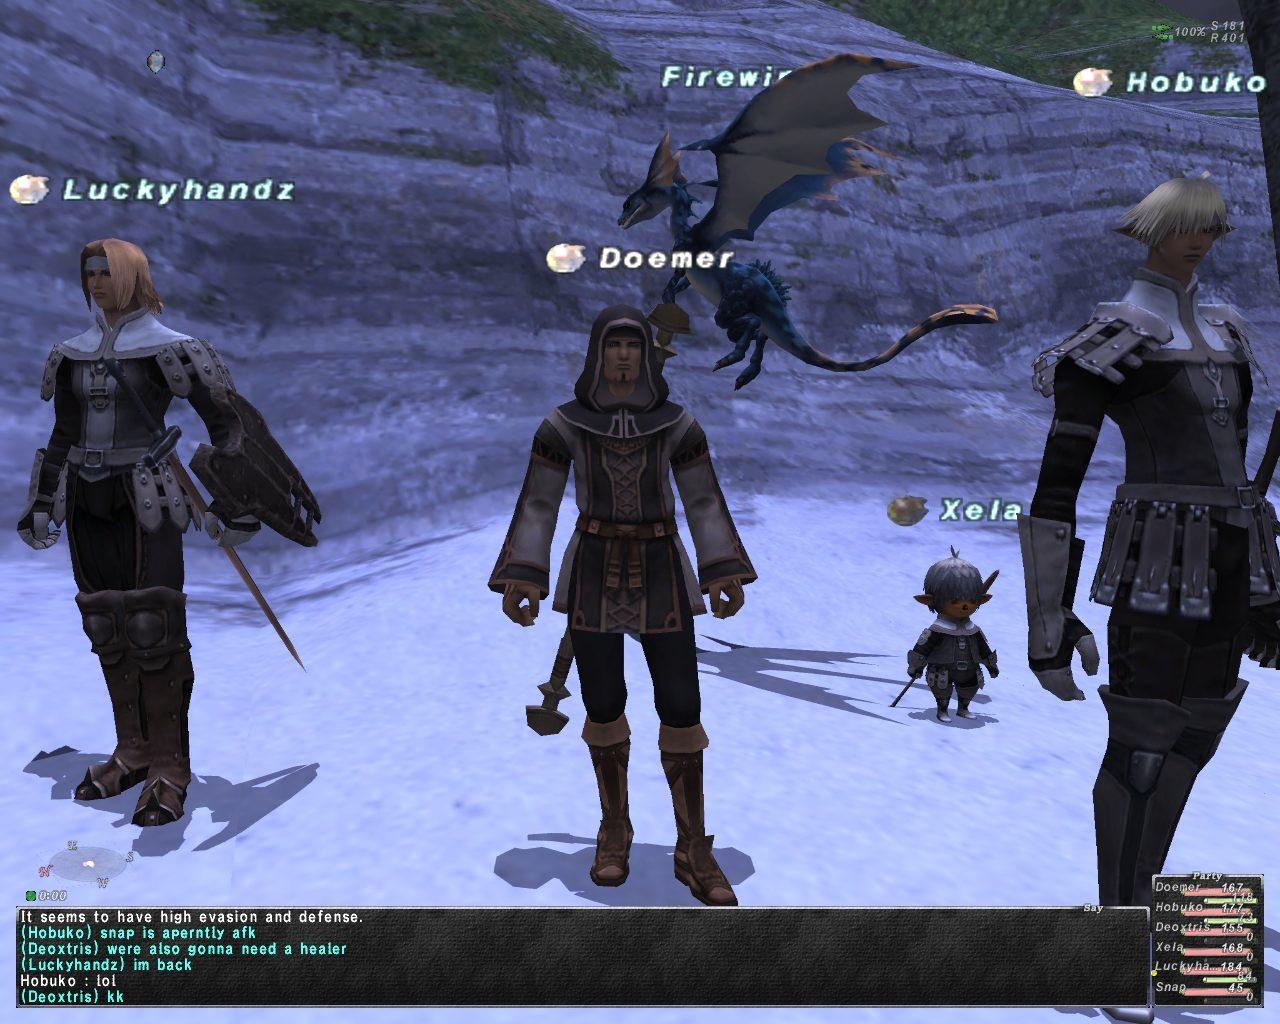 Final Fantasy XI in action. Picture courtesy of flickr user Attila Malarik.